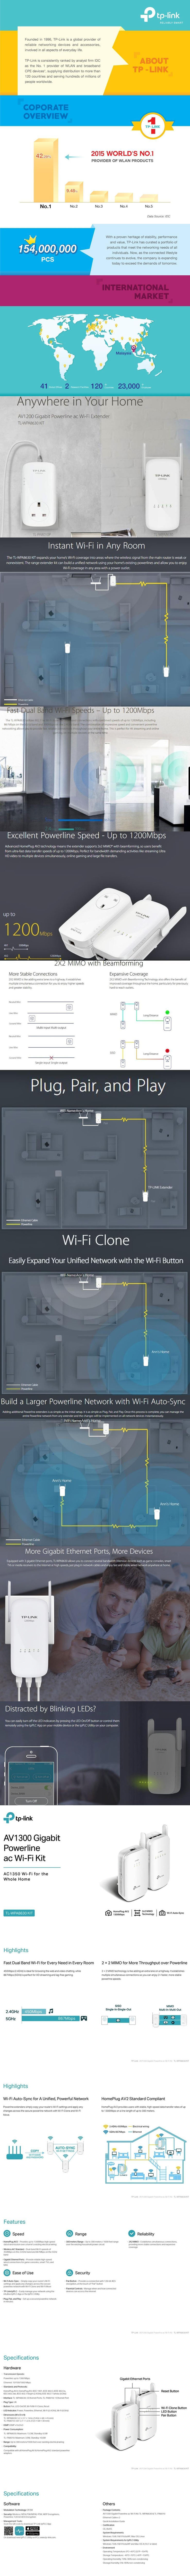 Tp Link Av1200 Gigabit Powerline A End 11 24 2018 1144 Am Tplink Diagram Ac Dual Band Wi Fi Kit Tl Wpa8630